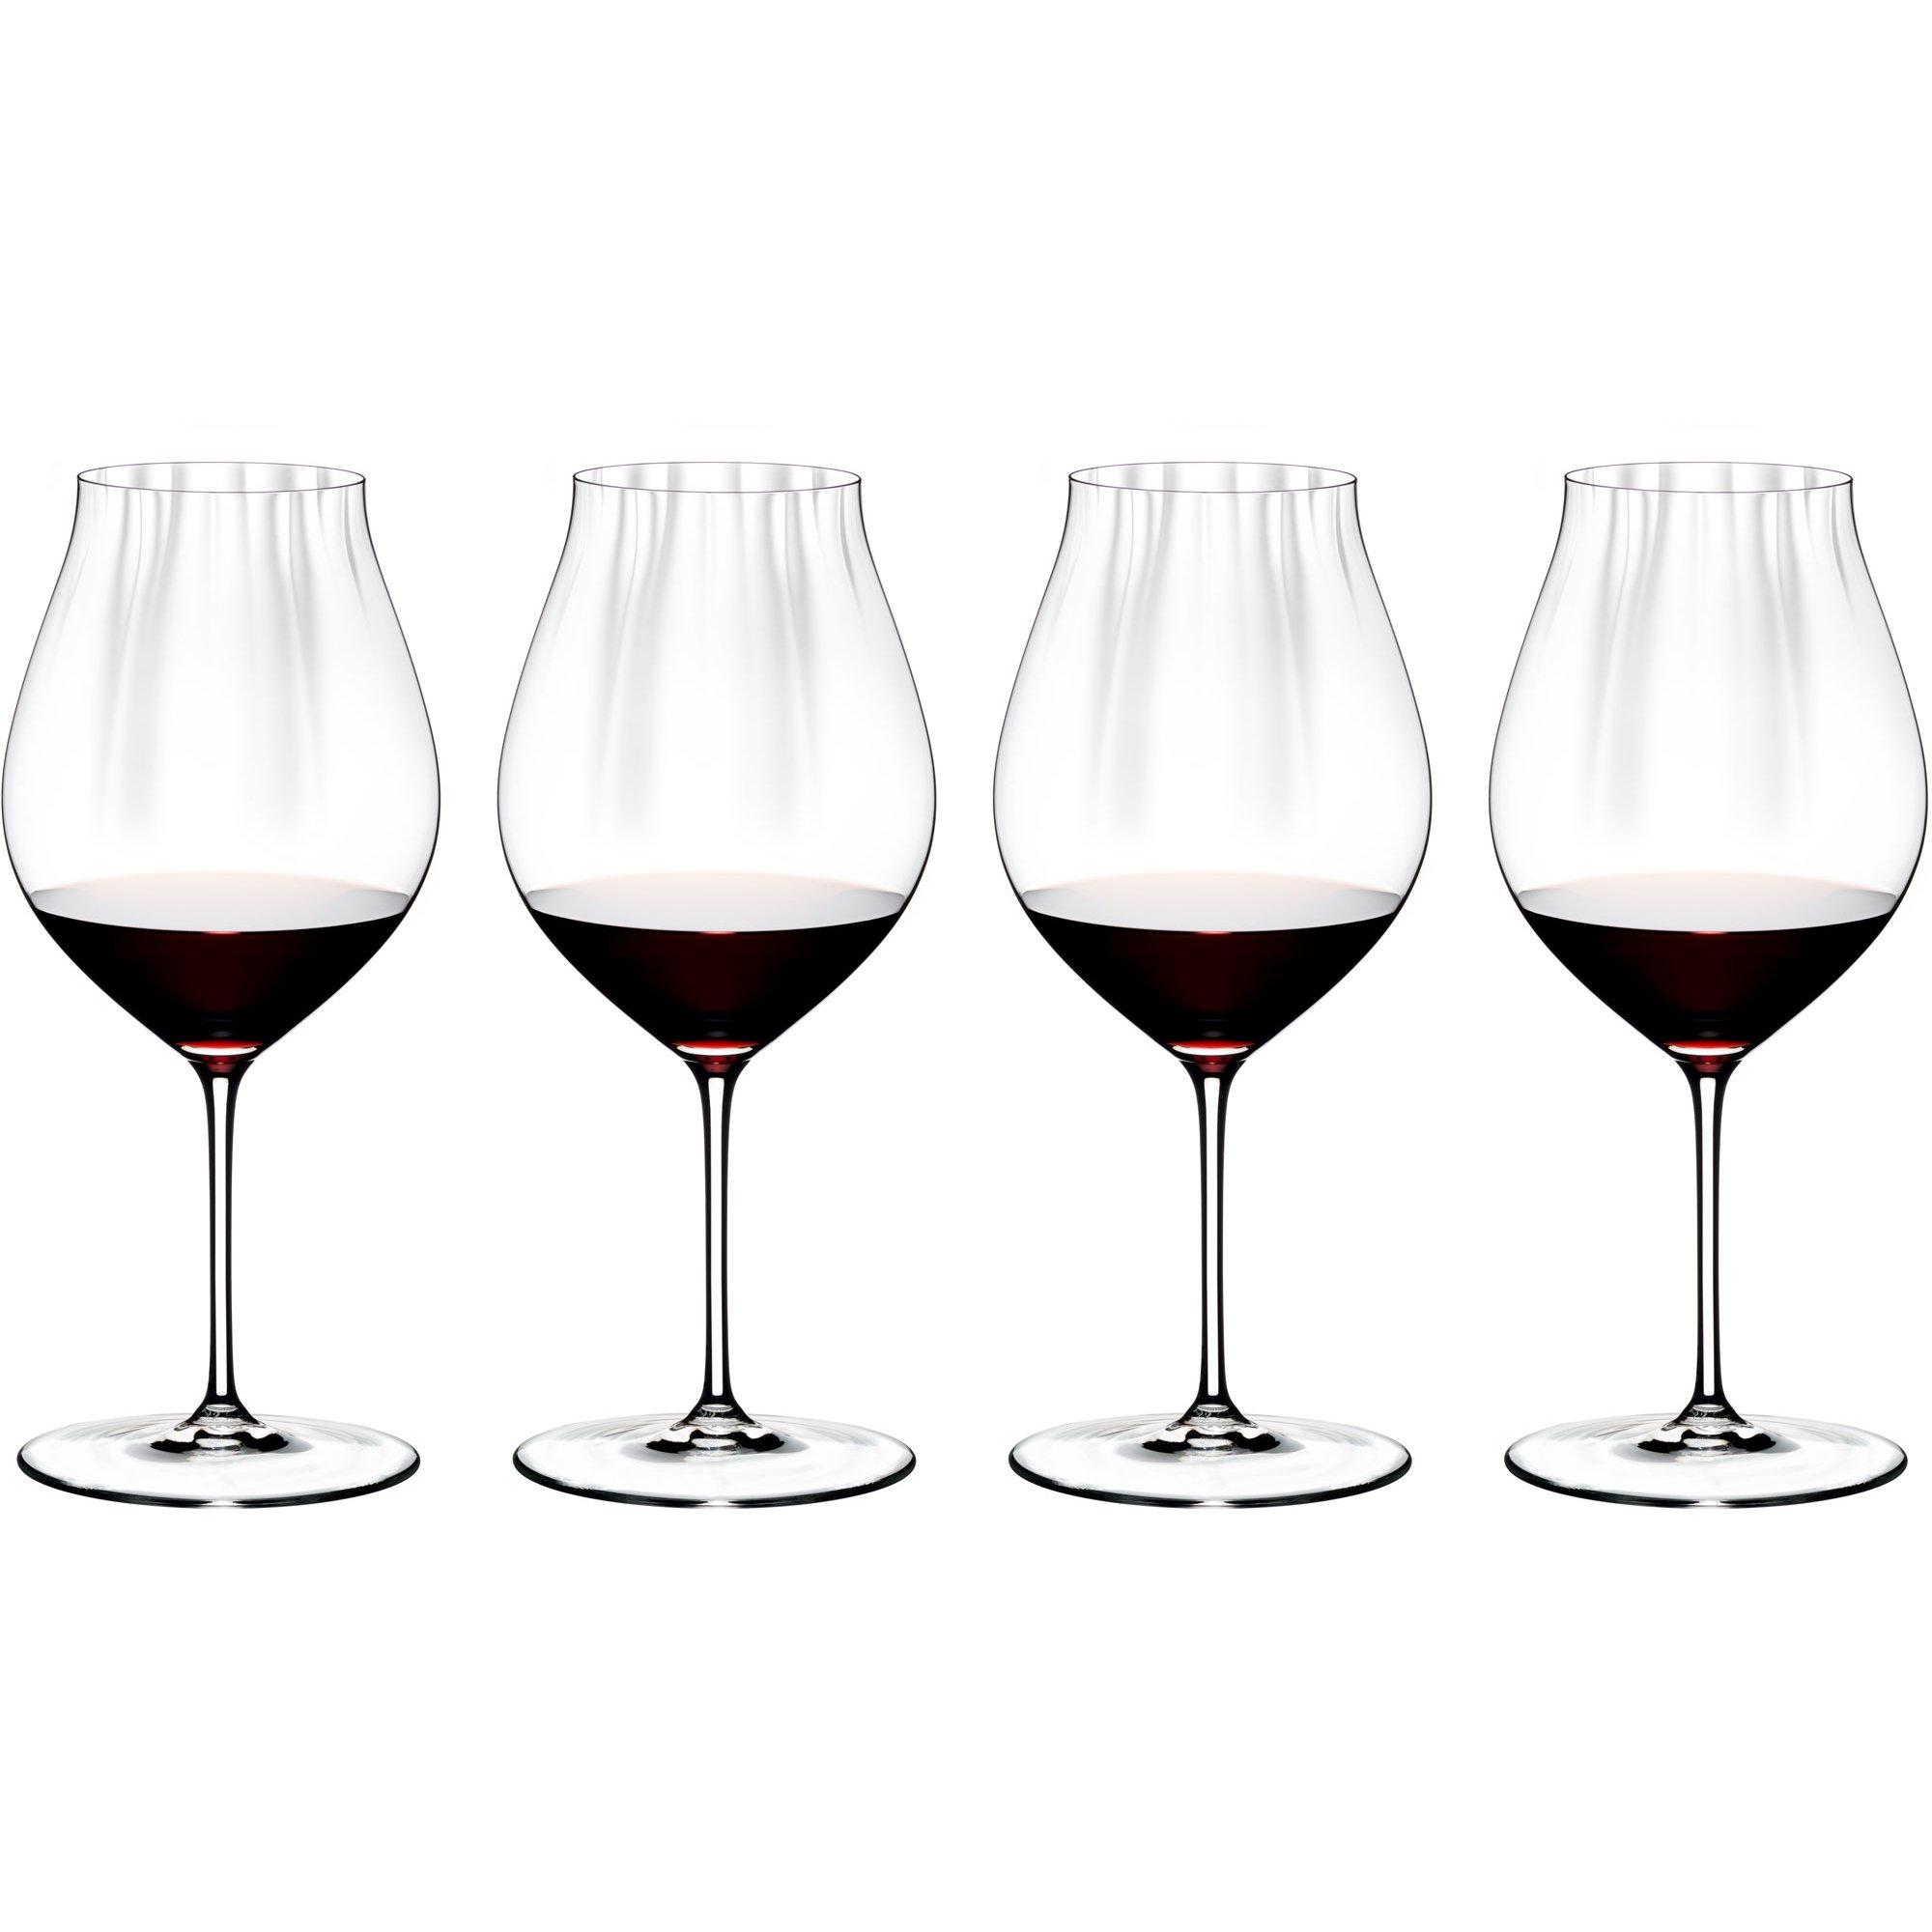 Riedel Preformance Pinot Noir rödvinsglas 4 st.